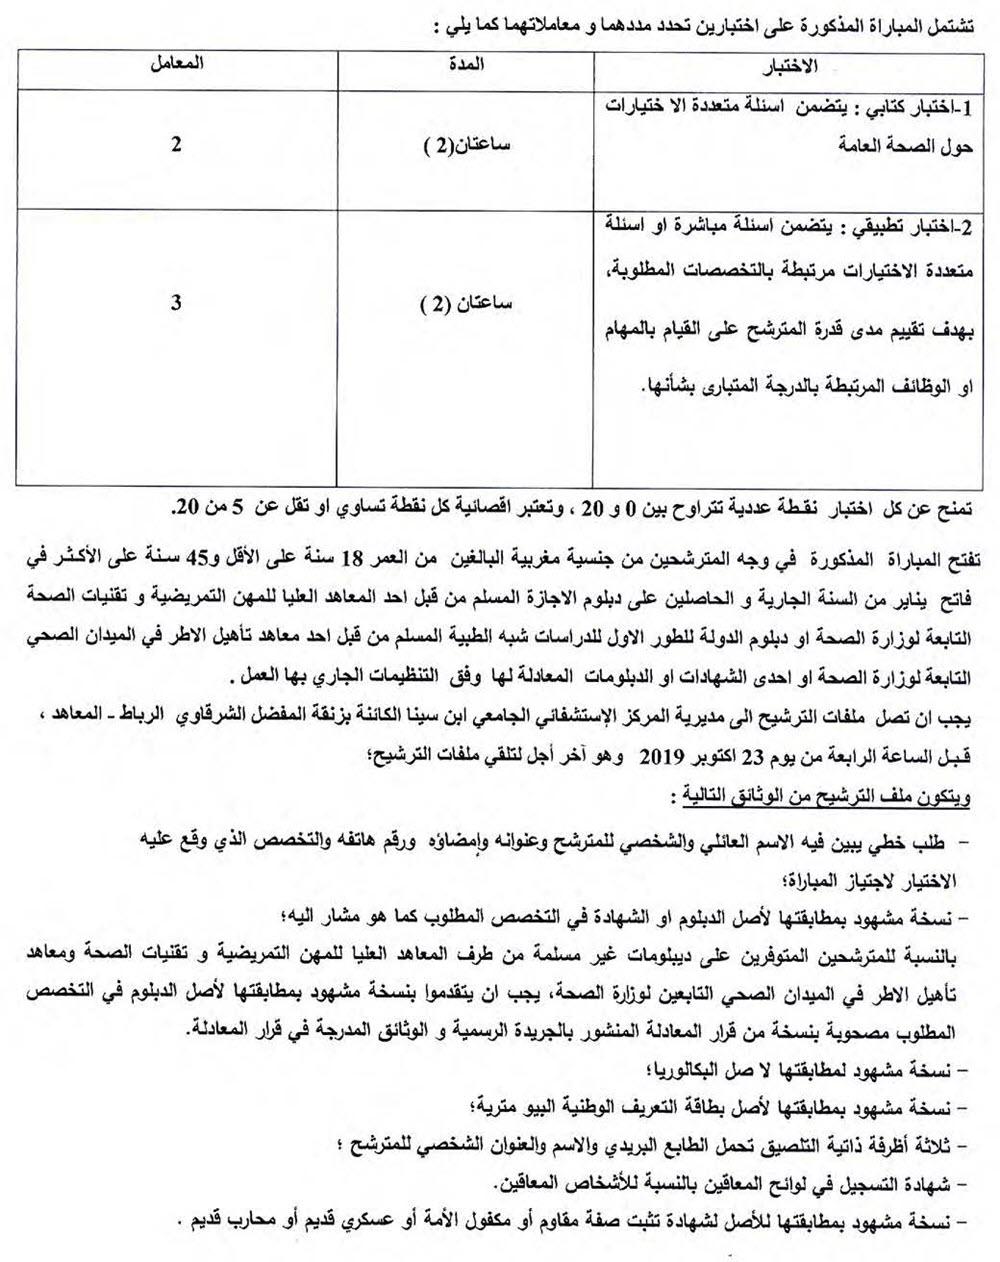 CHU Ibn Sina Rabat recrutement 219 IDE et 38 Techniciens 2019